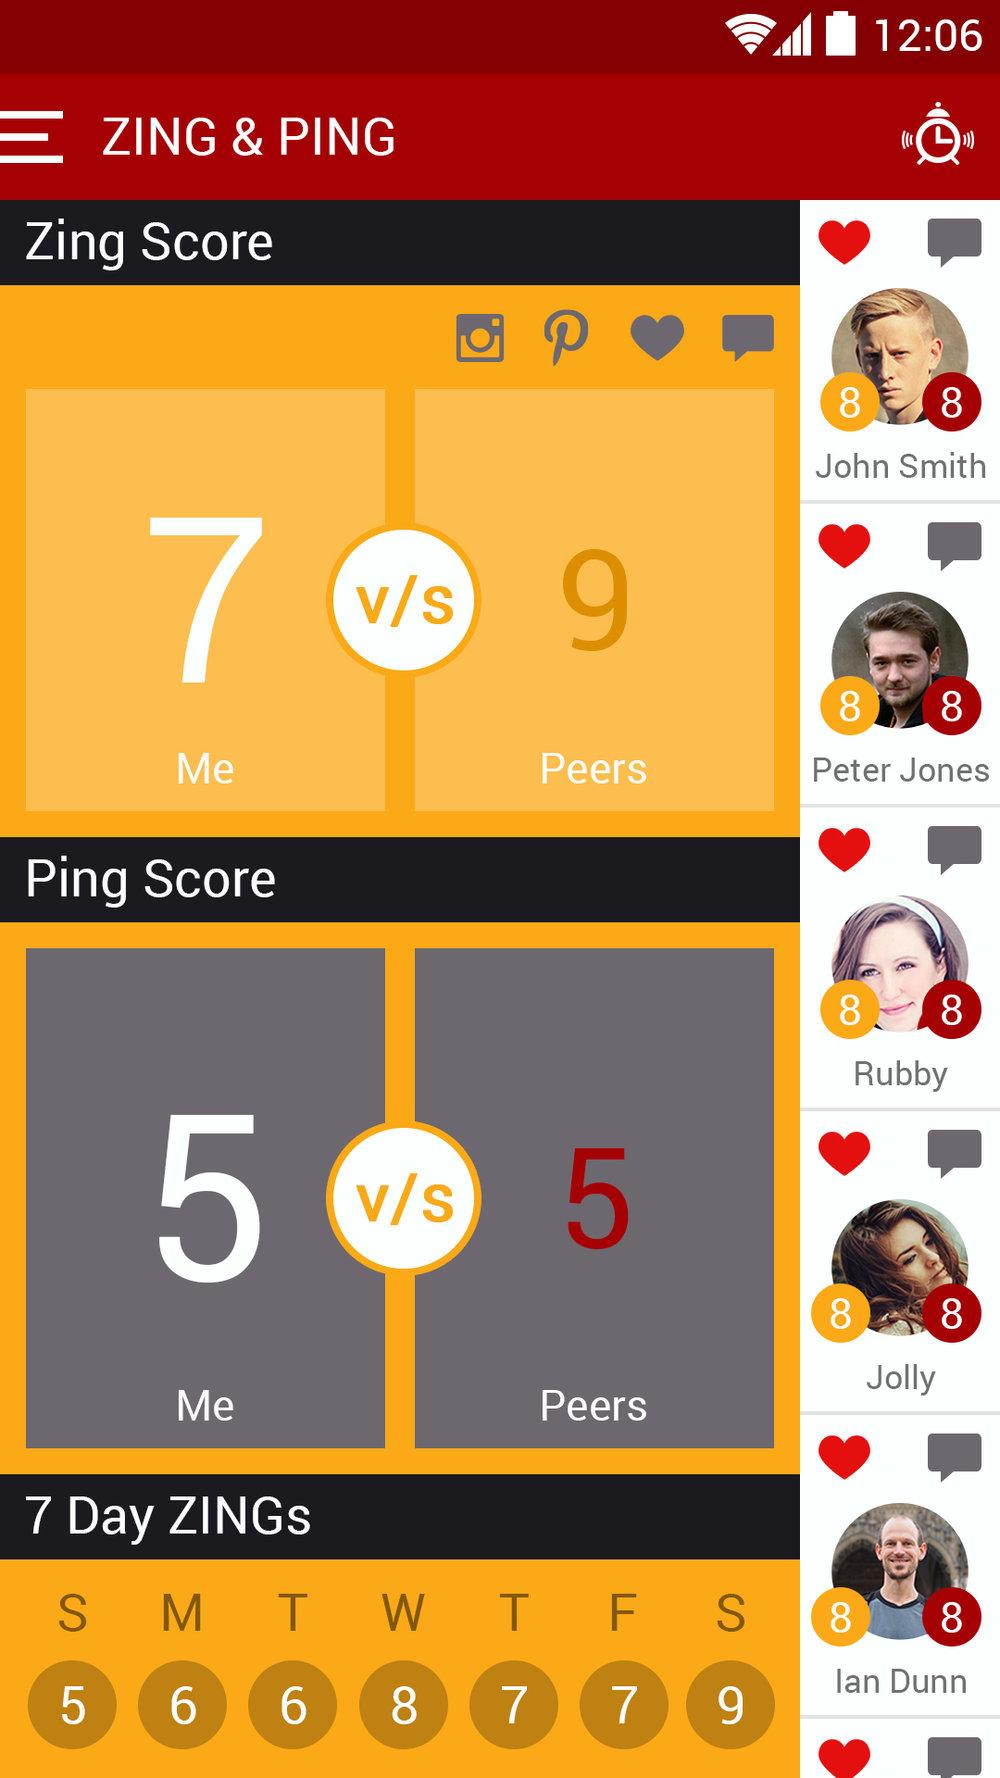 Figure 4. ZING score